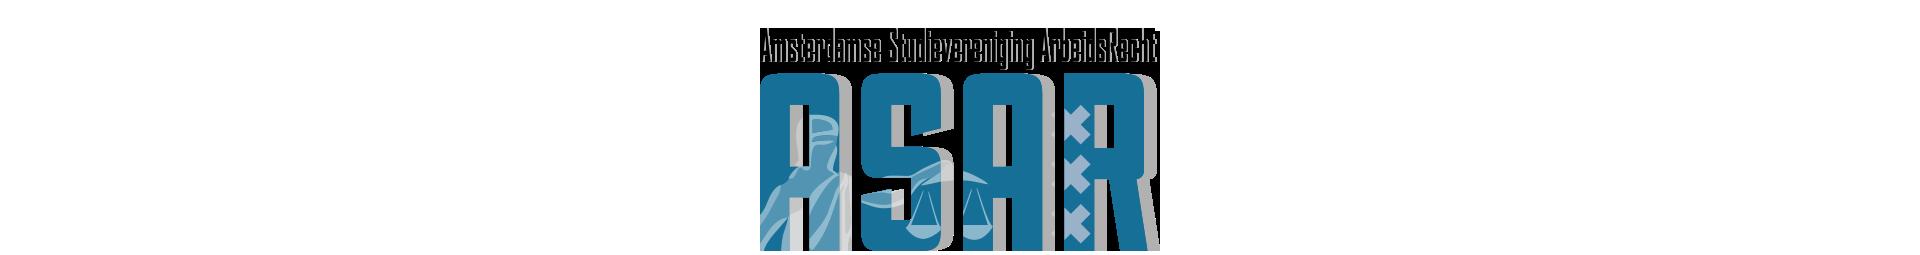 Amsterdamse Studievereniging ArbeidsRecht